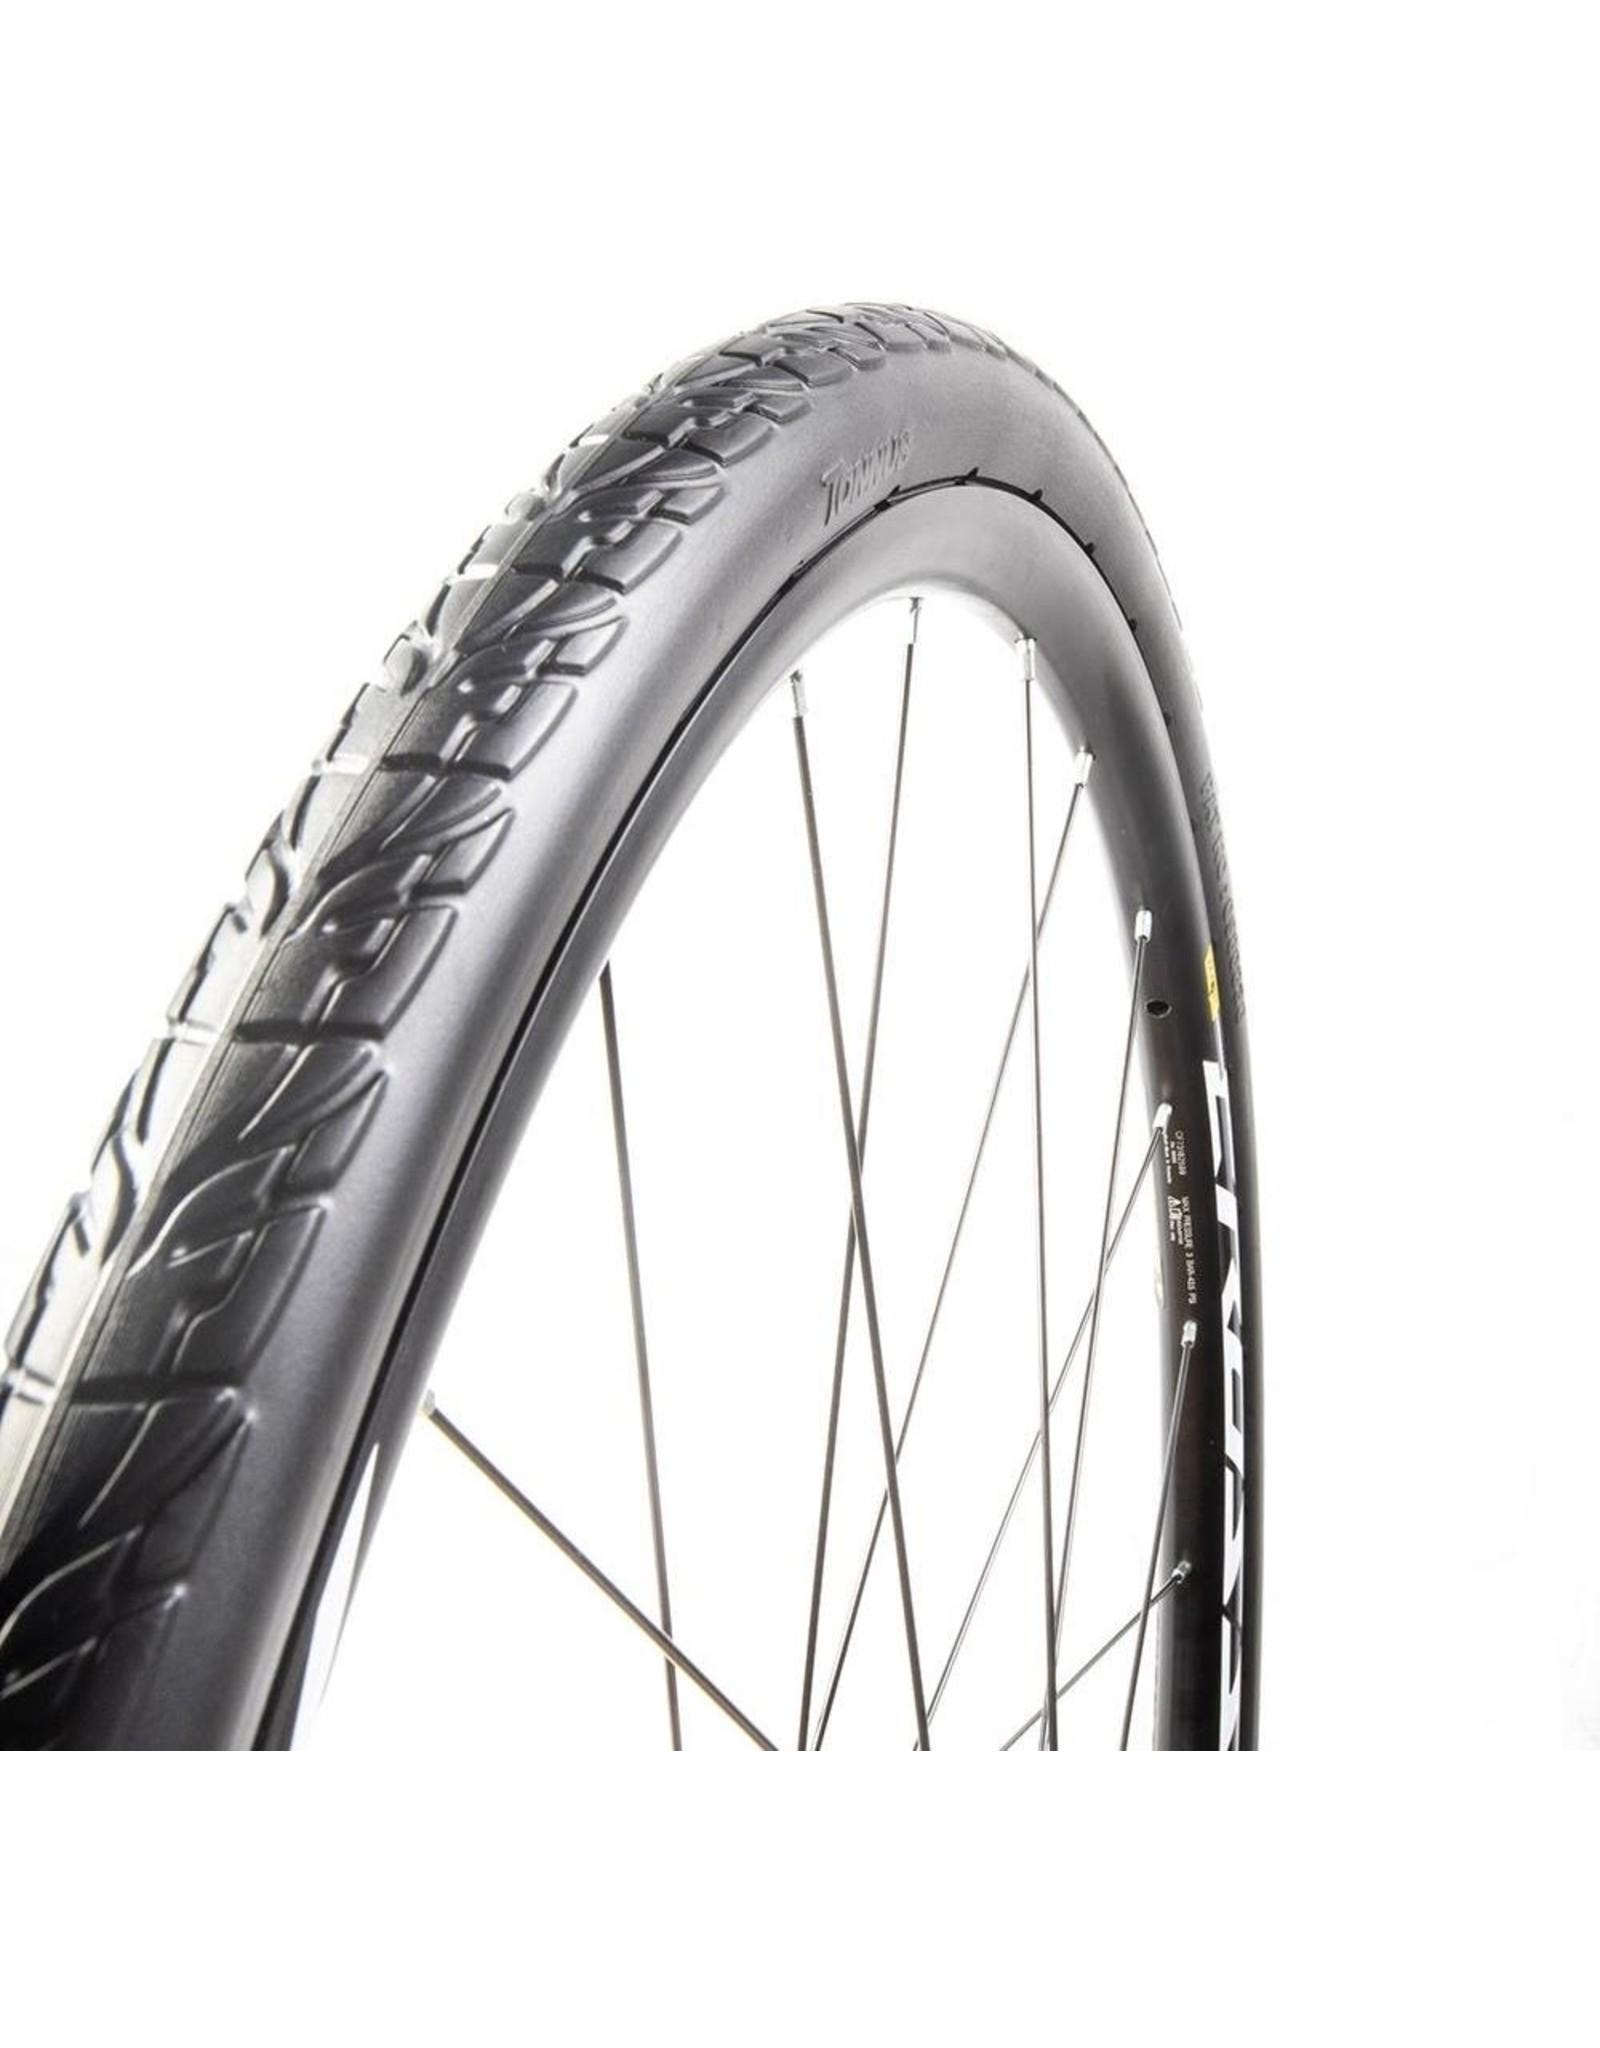 "Tannus Tannus Shield 20x1.5"" Airless Tire - Black"